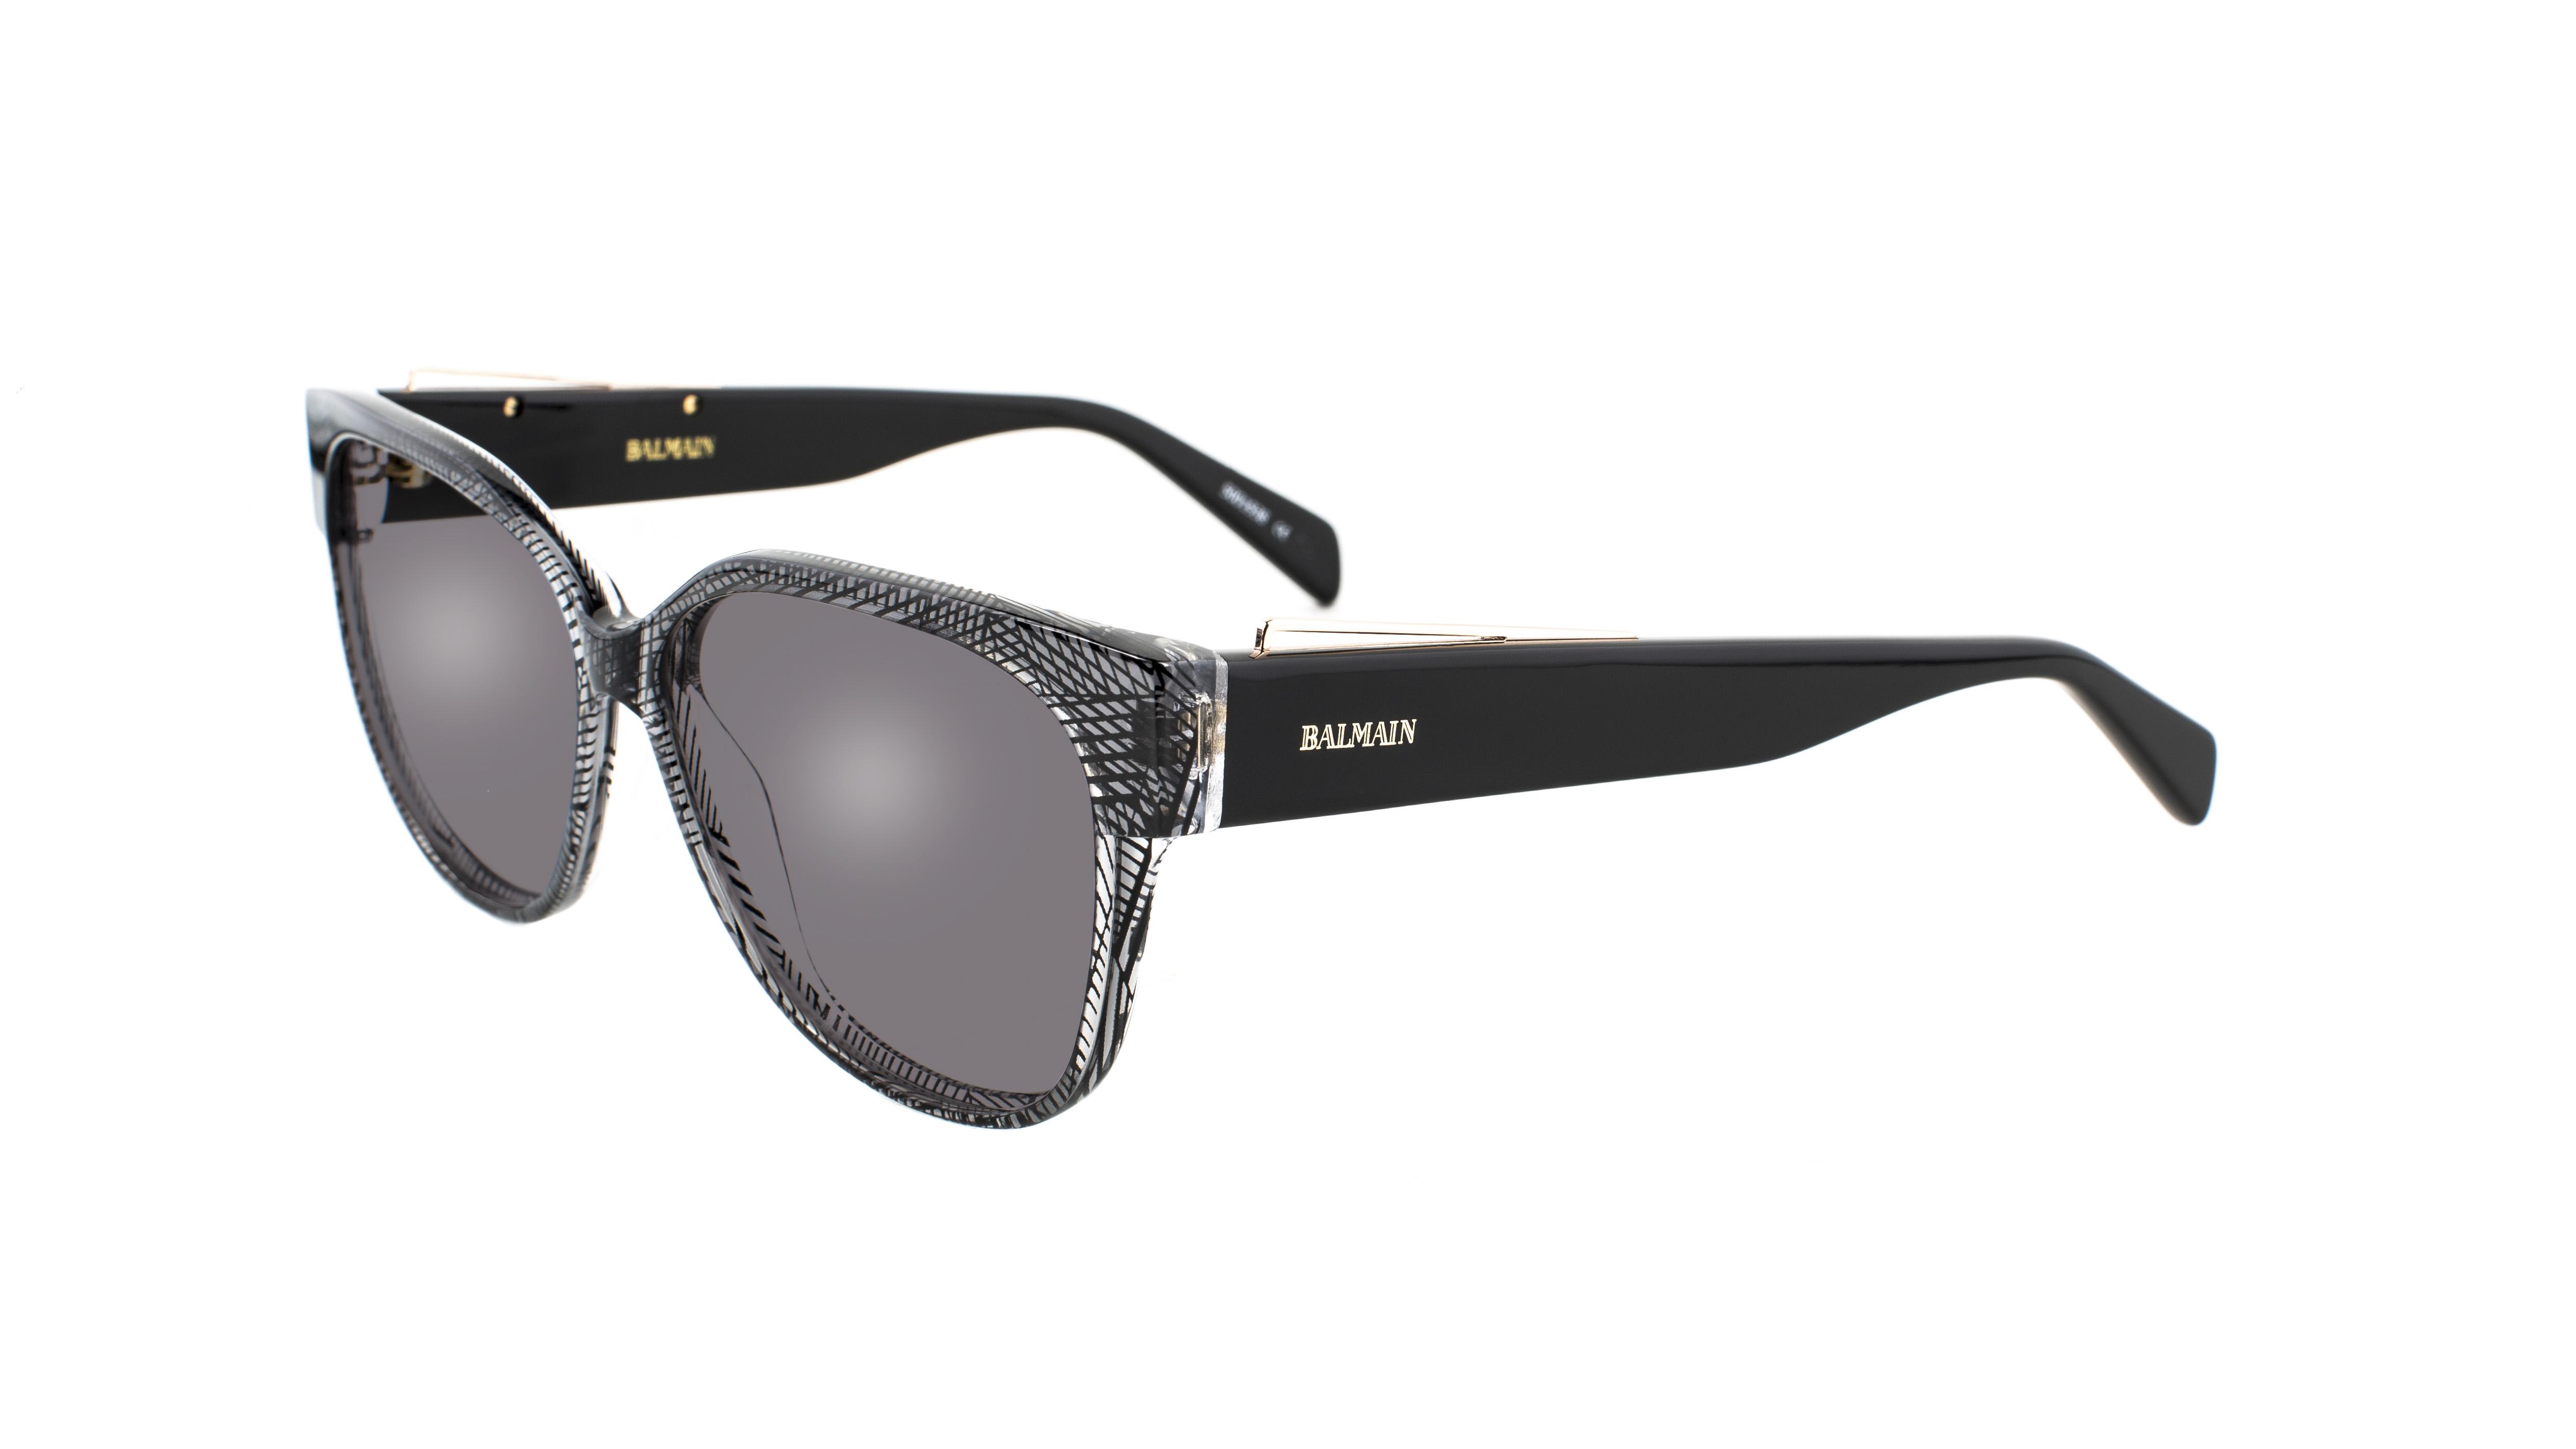 Balmain x Specsavers BL15015 SUN RX 30686915 - RRP 2 pairs single vision $459 (2)